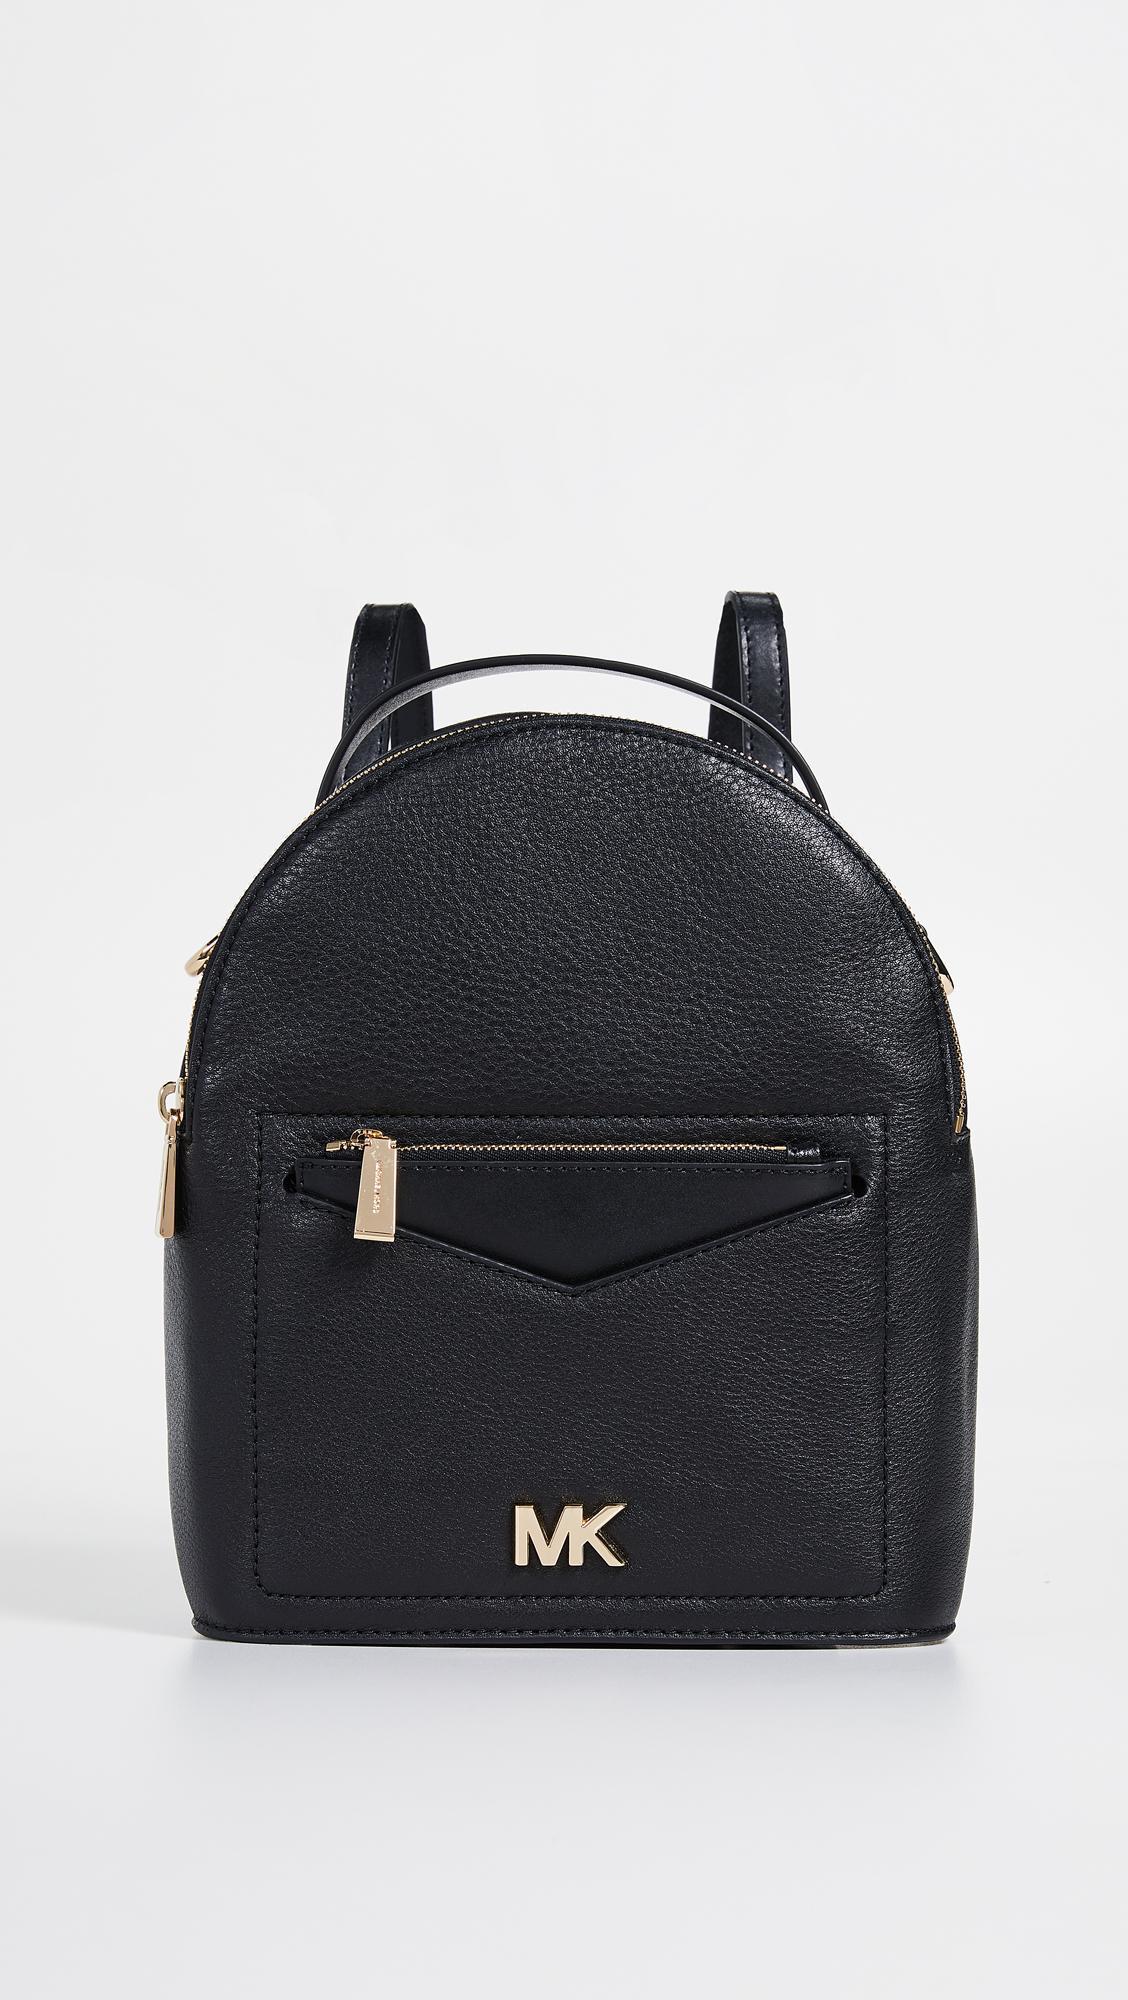 af56c7cdbea7 Michael Michael Kors Jessa Small Convertible Backpack in Black - Lyst